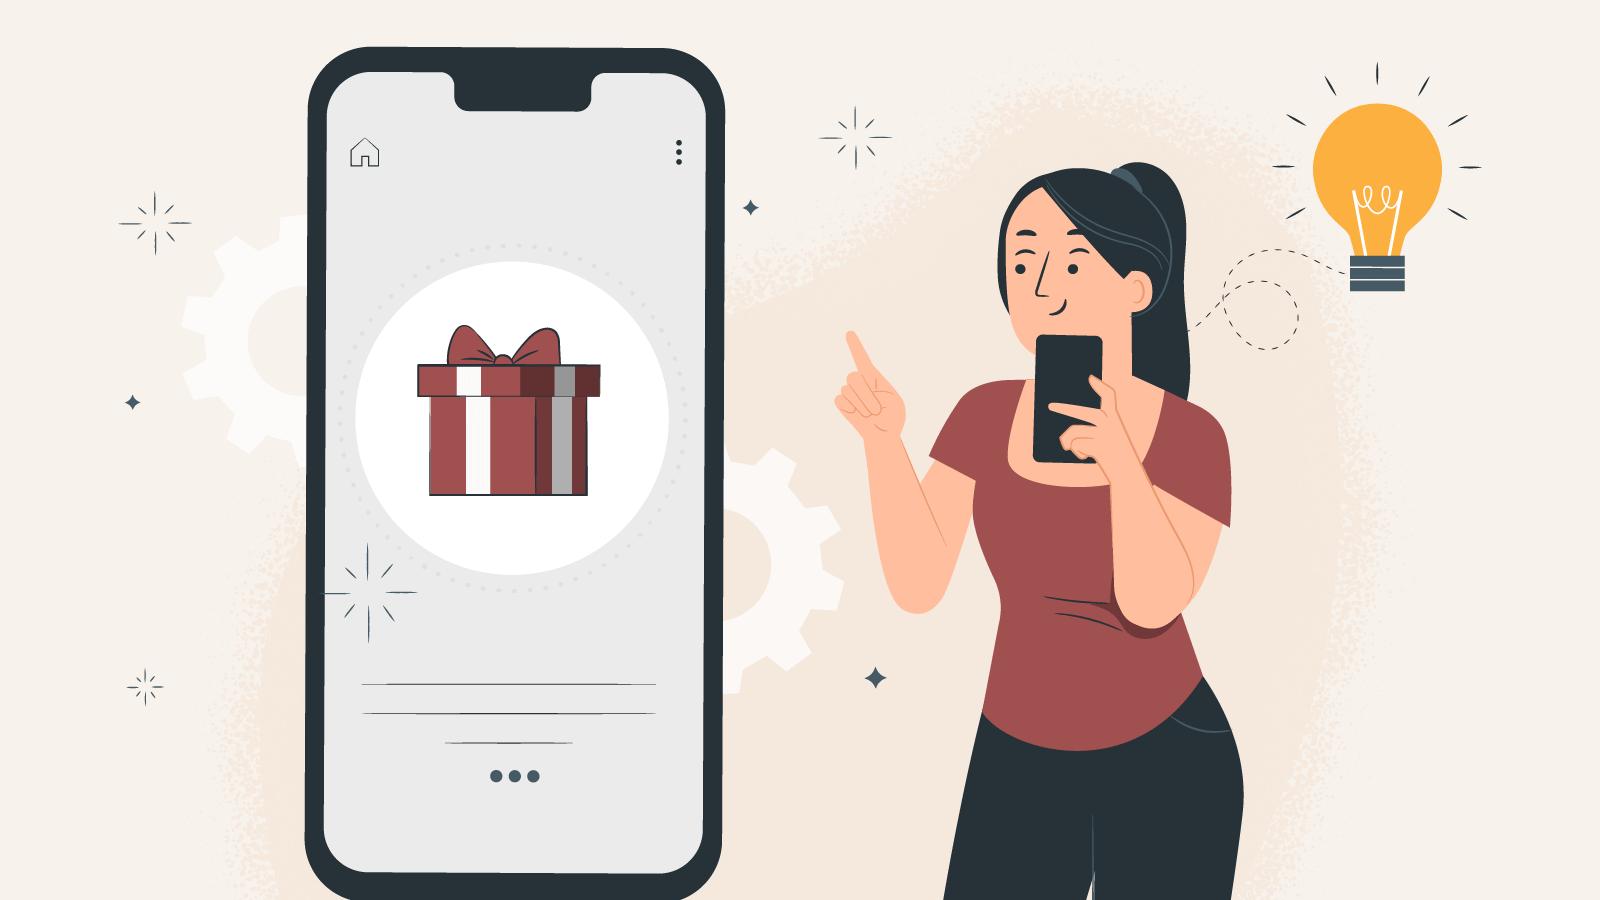 How to claim a first deposit bonus